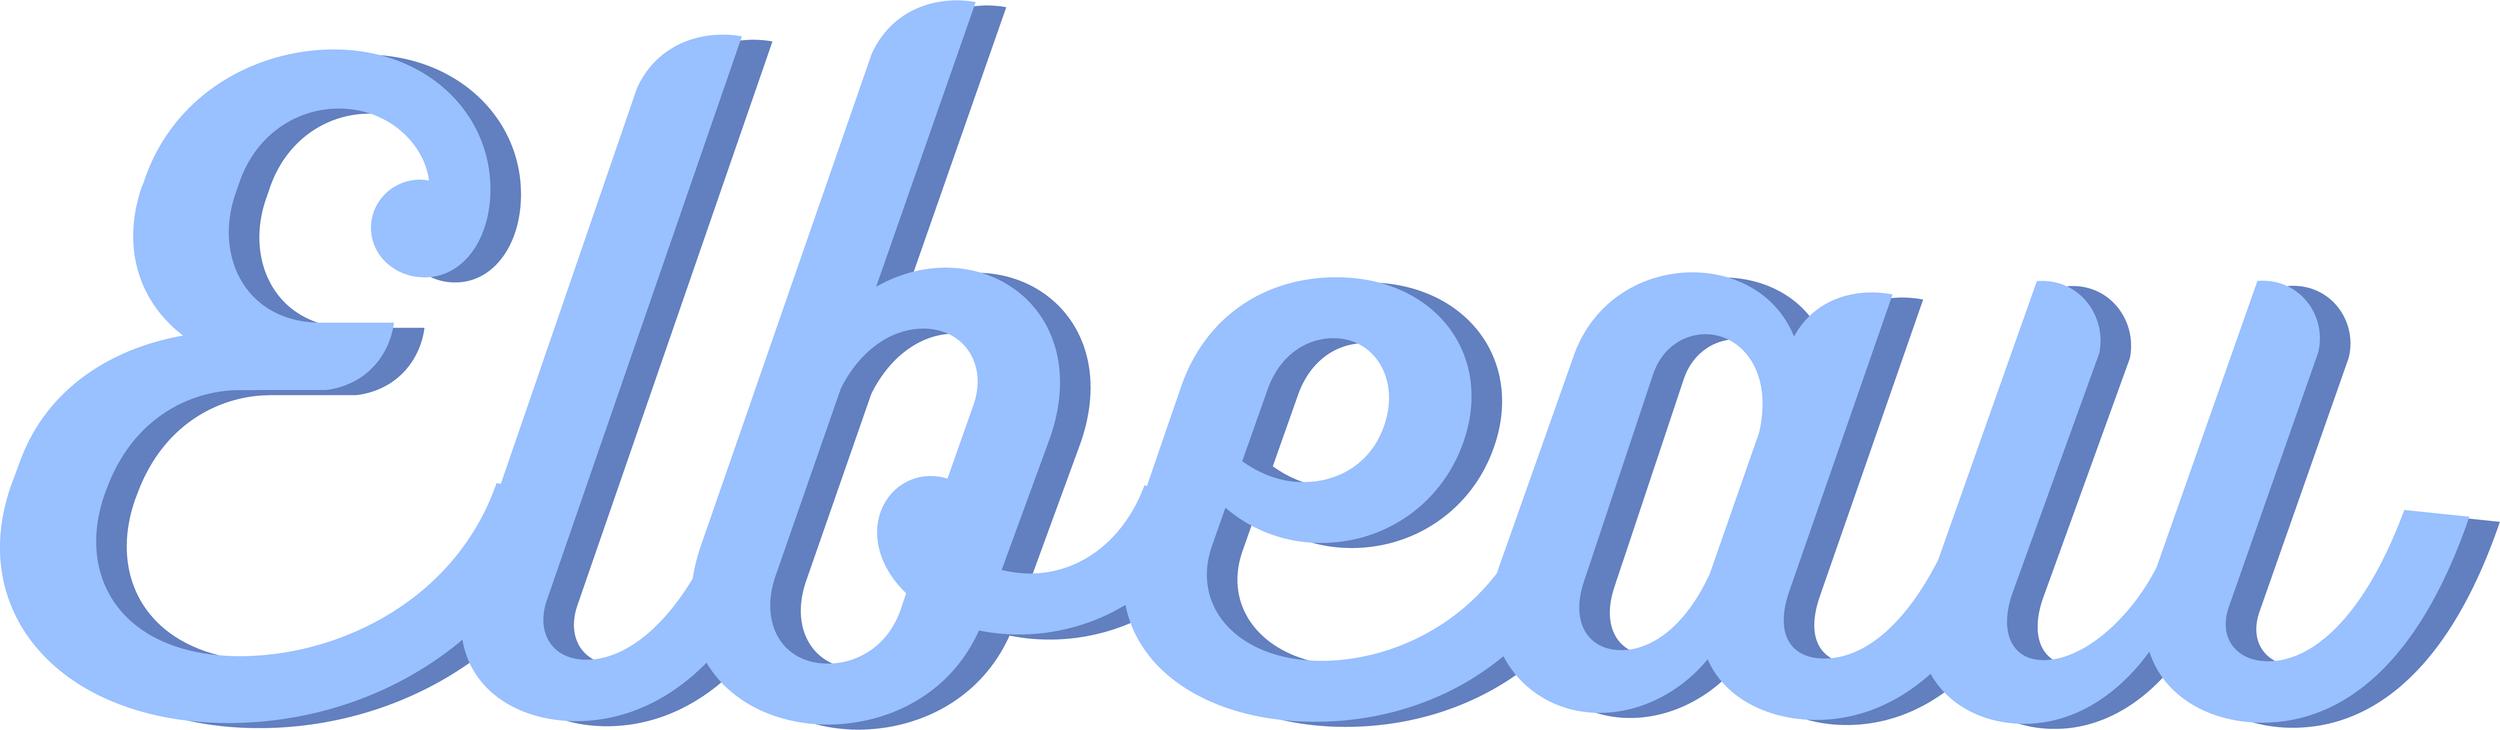 elbeau logo.png